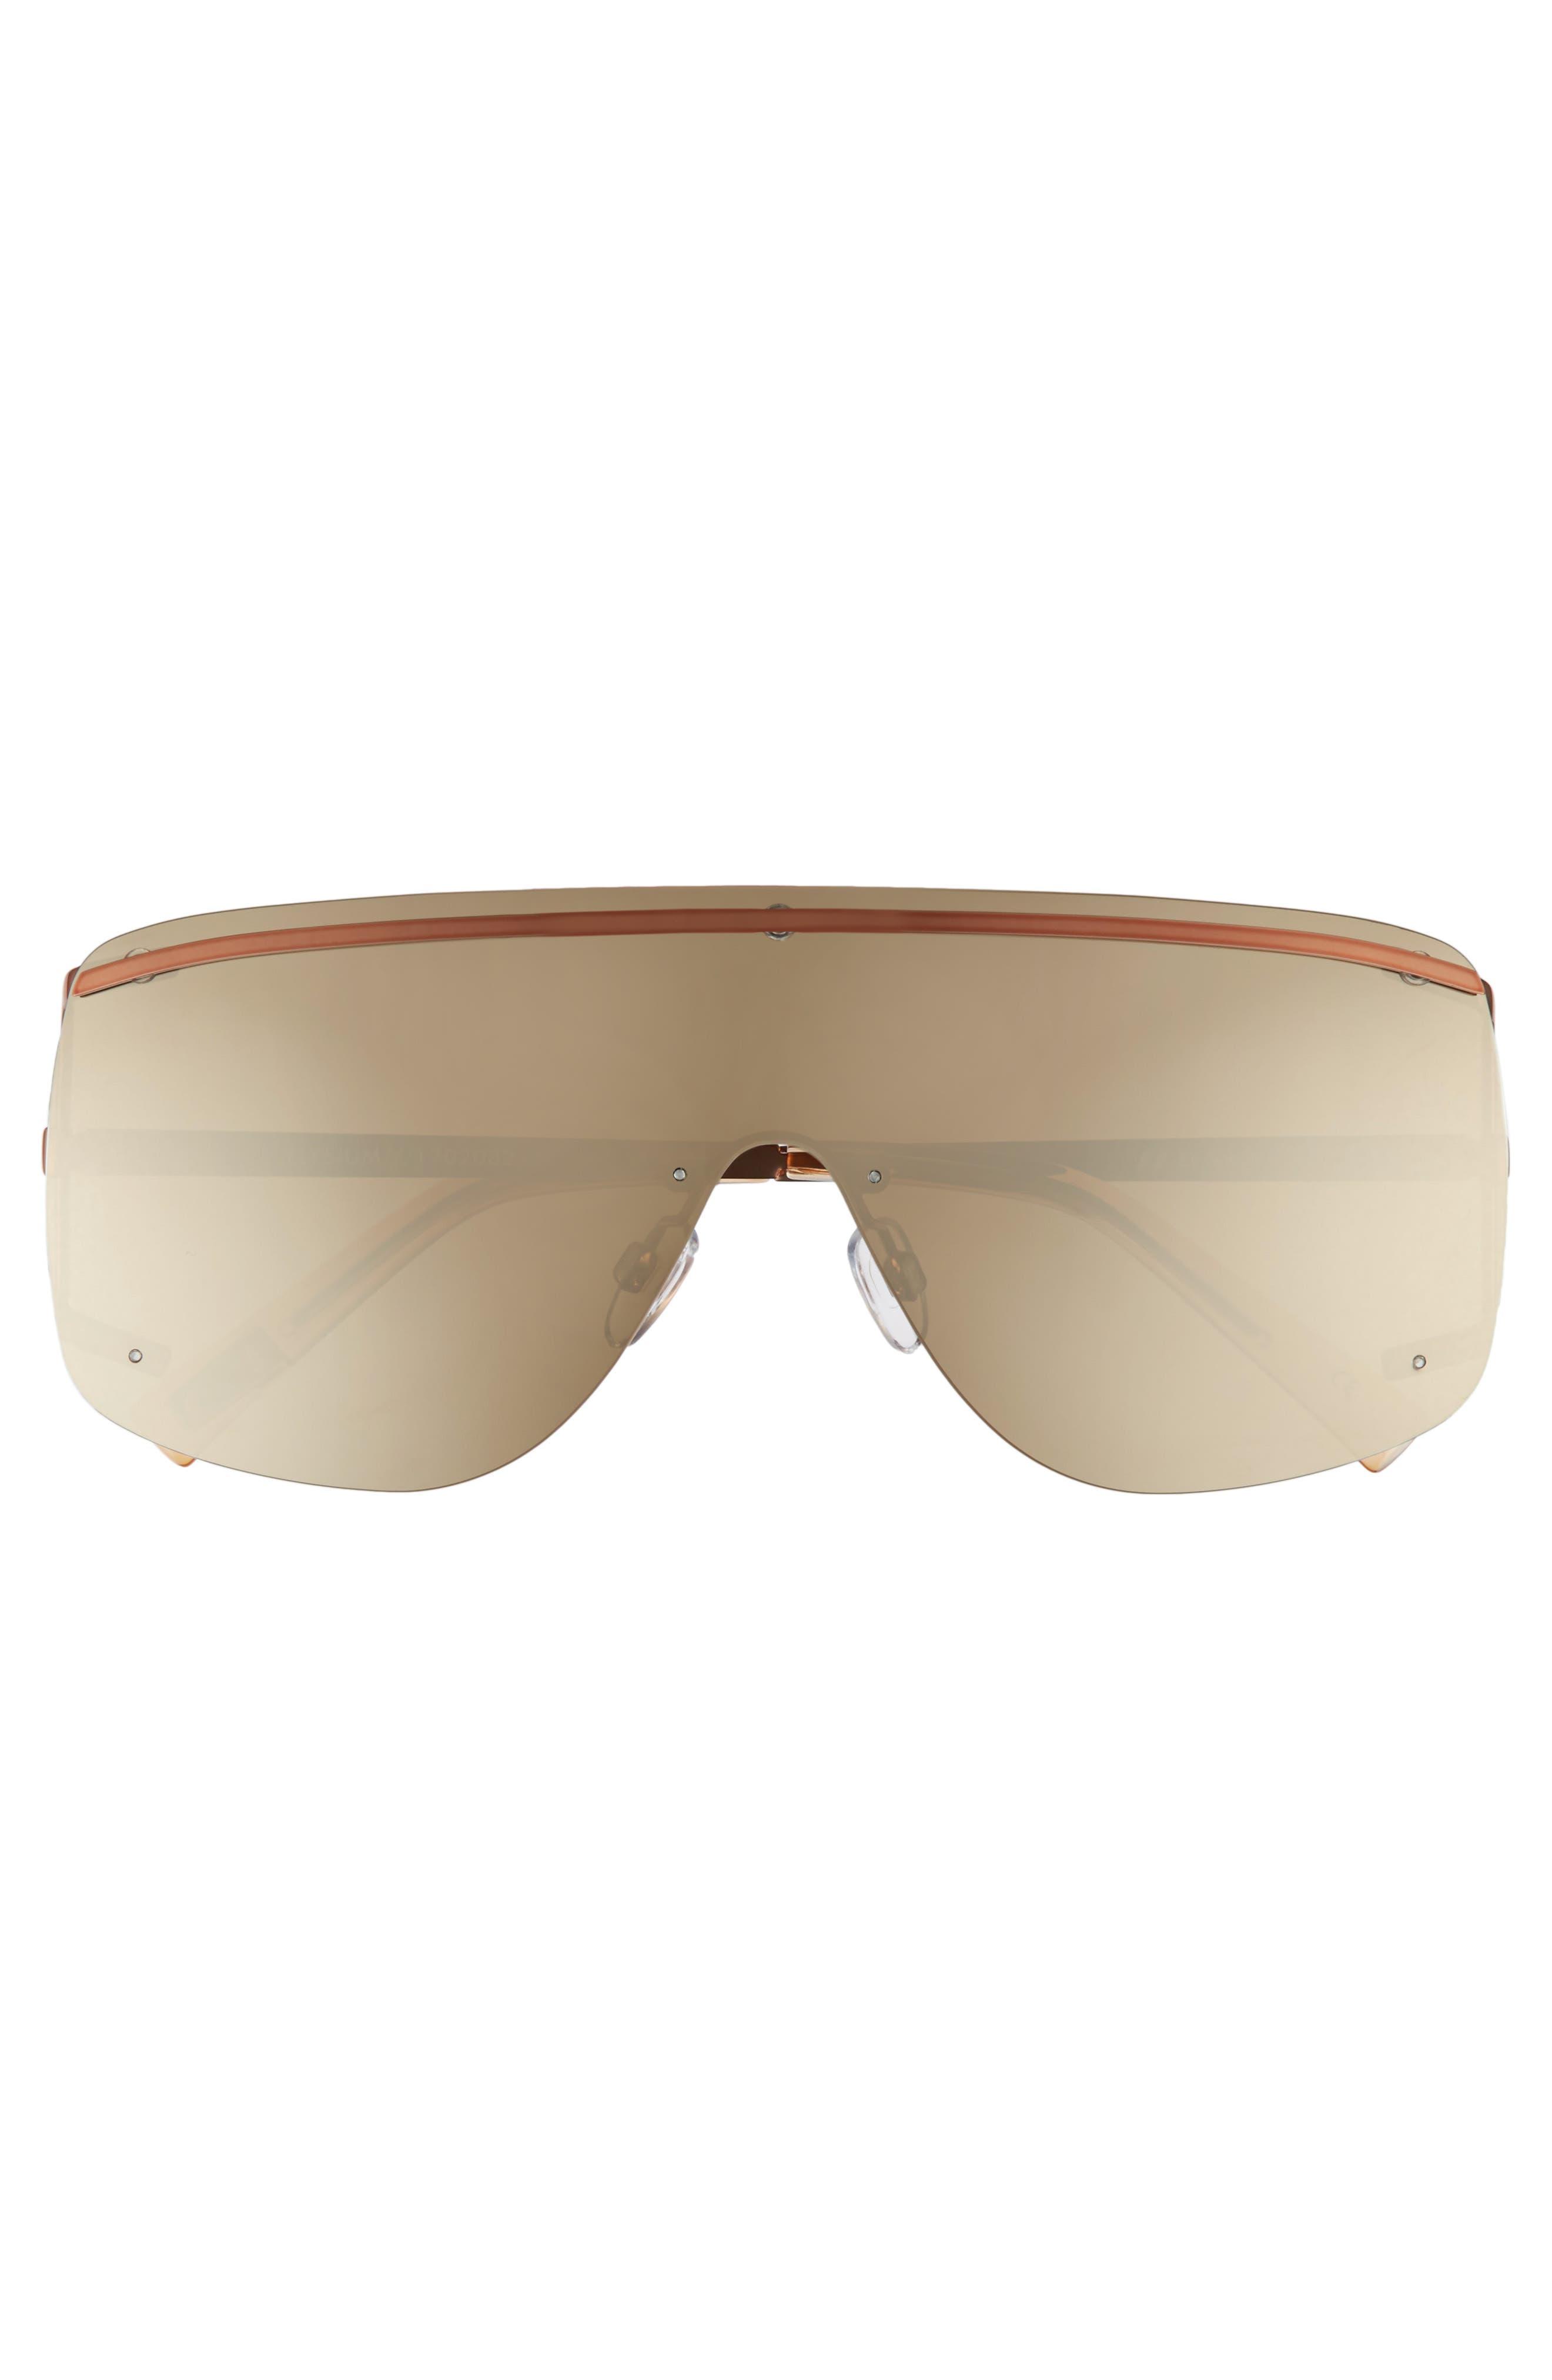 Elysium 140mm Shield Sunglasses,                             Alternate thumbnail 3, color,                             COPPER